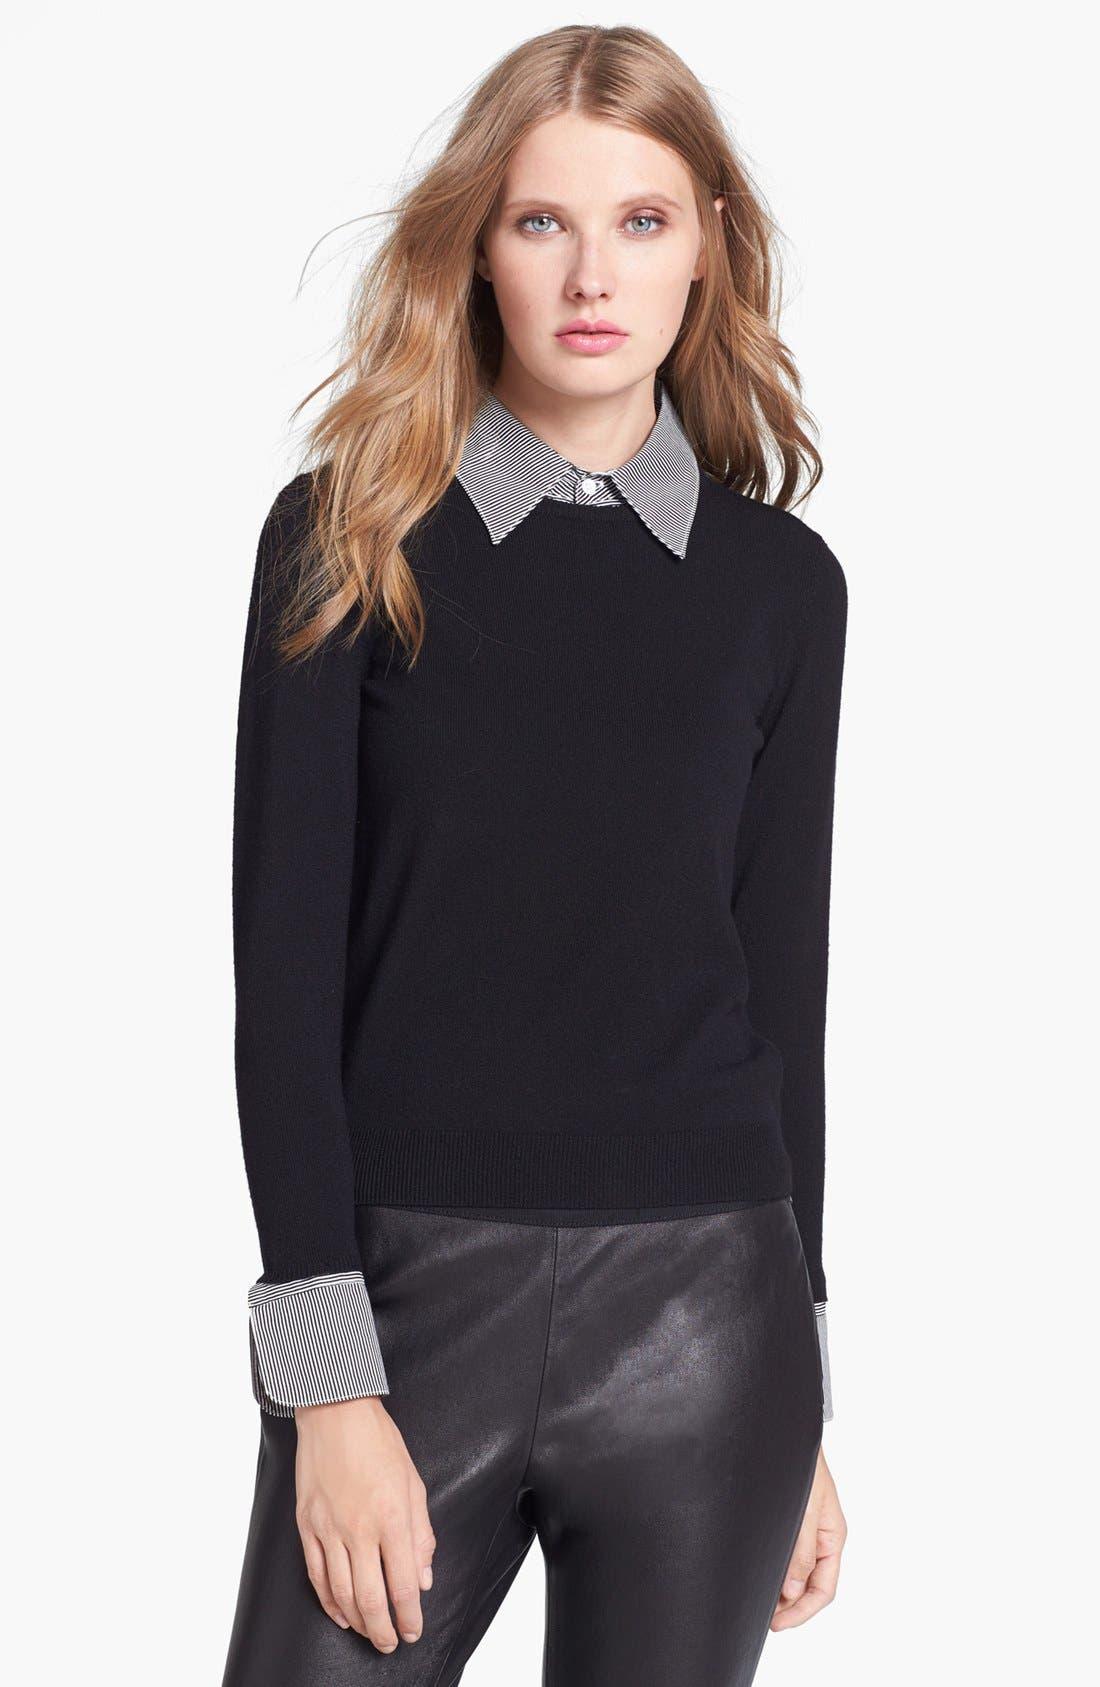 Alternate Image 1 Selected - Alice + Olivia 'Wiley' Contrast Trim Sweater